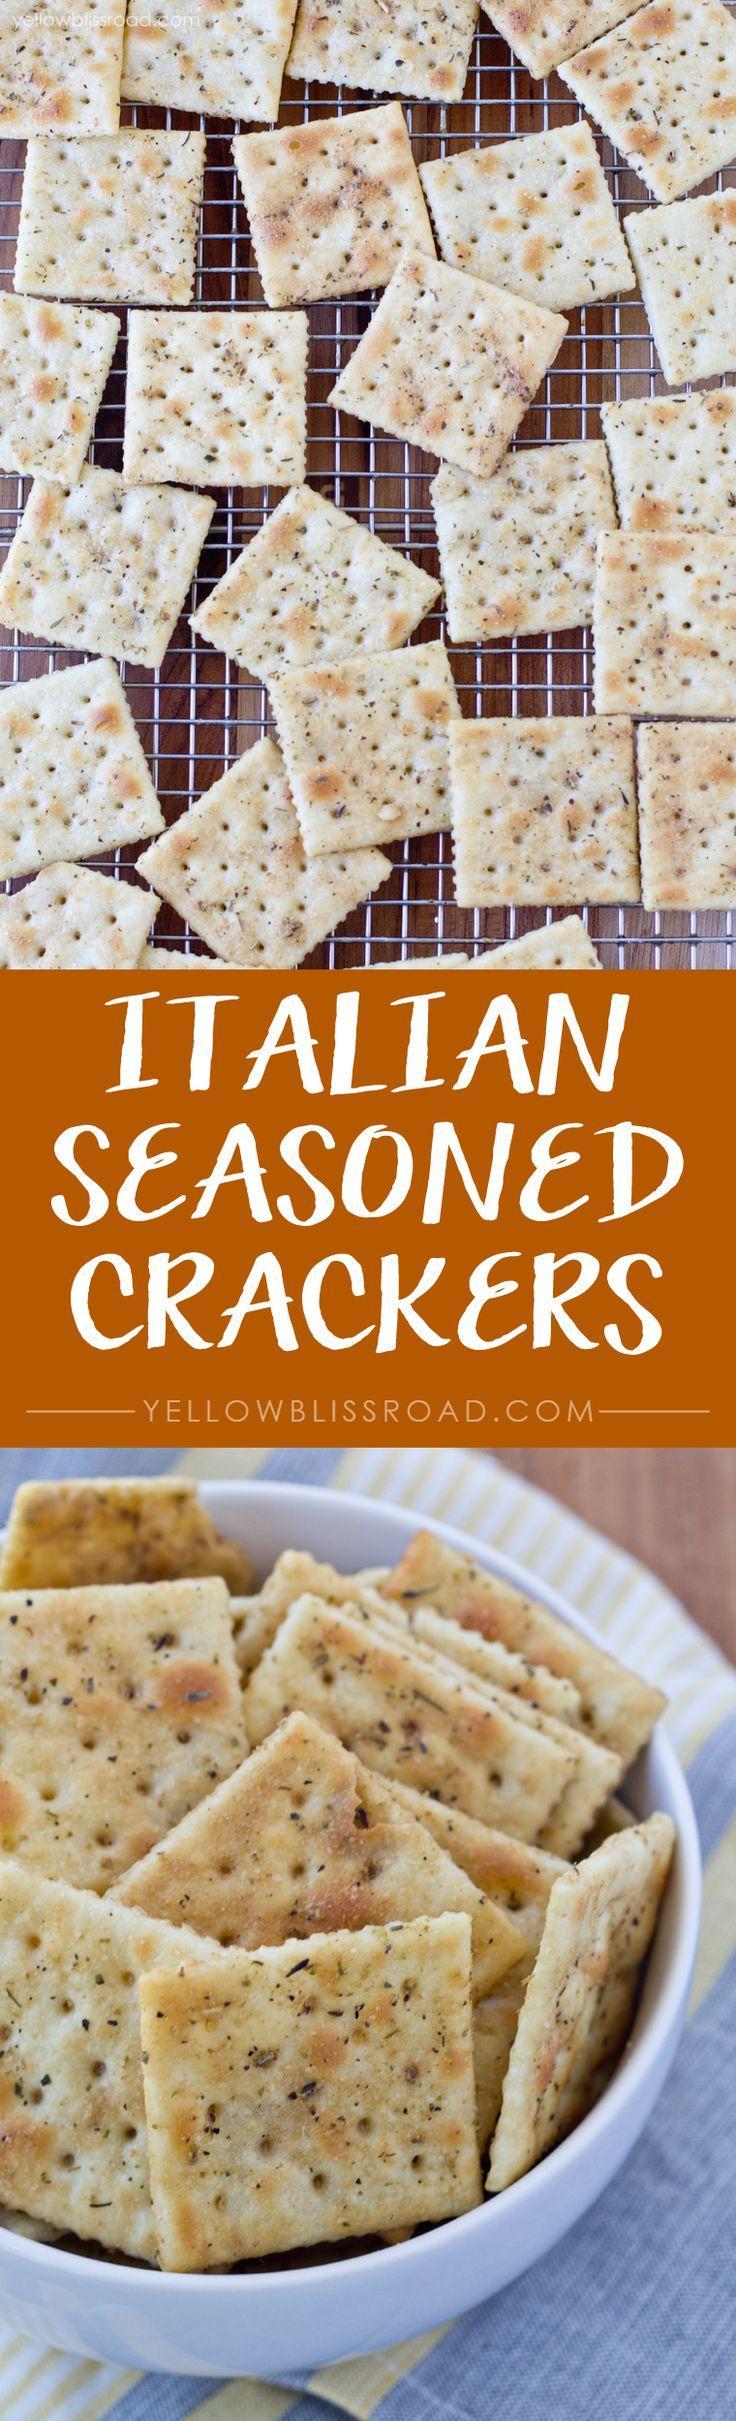 Italian Seasoned Crackers - Easy to make and easy to customize!